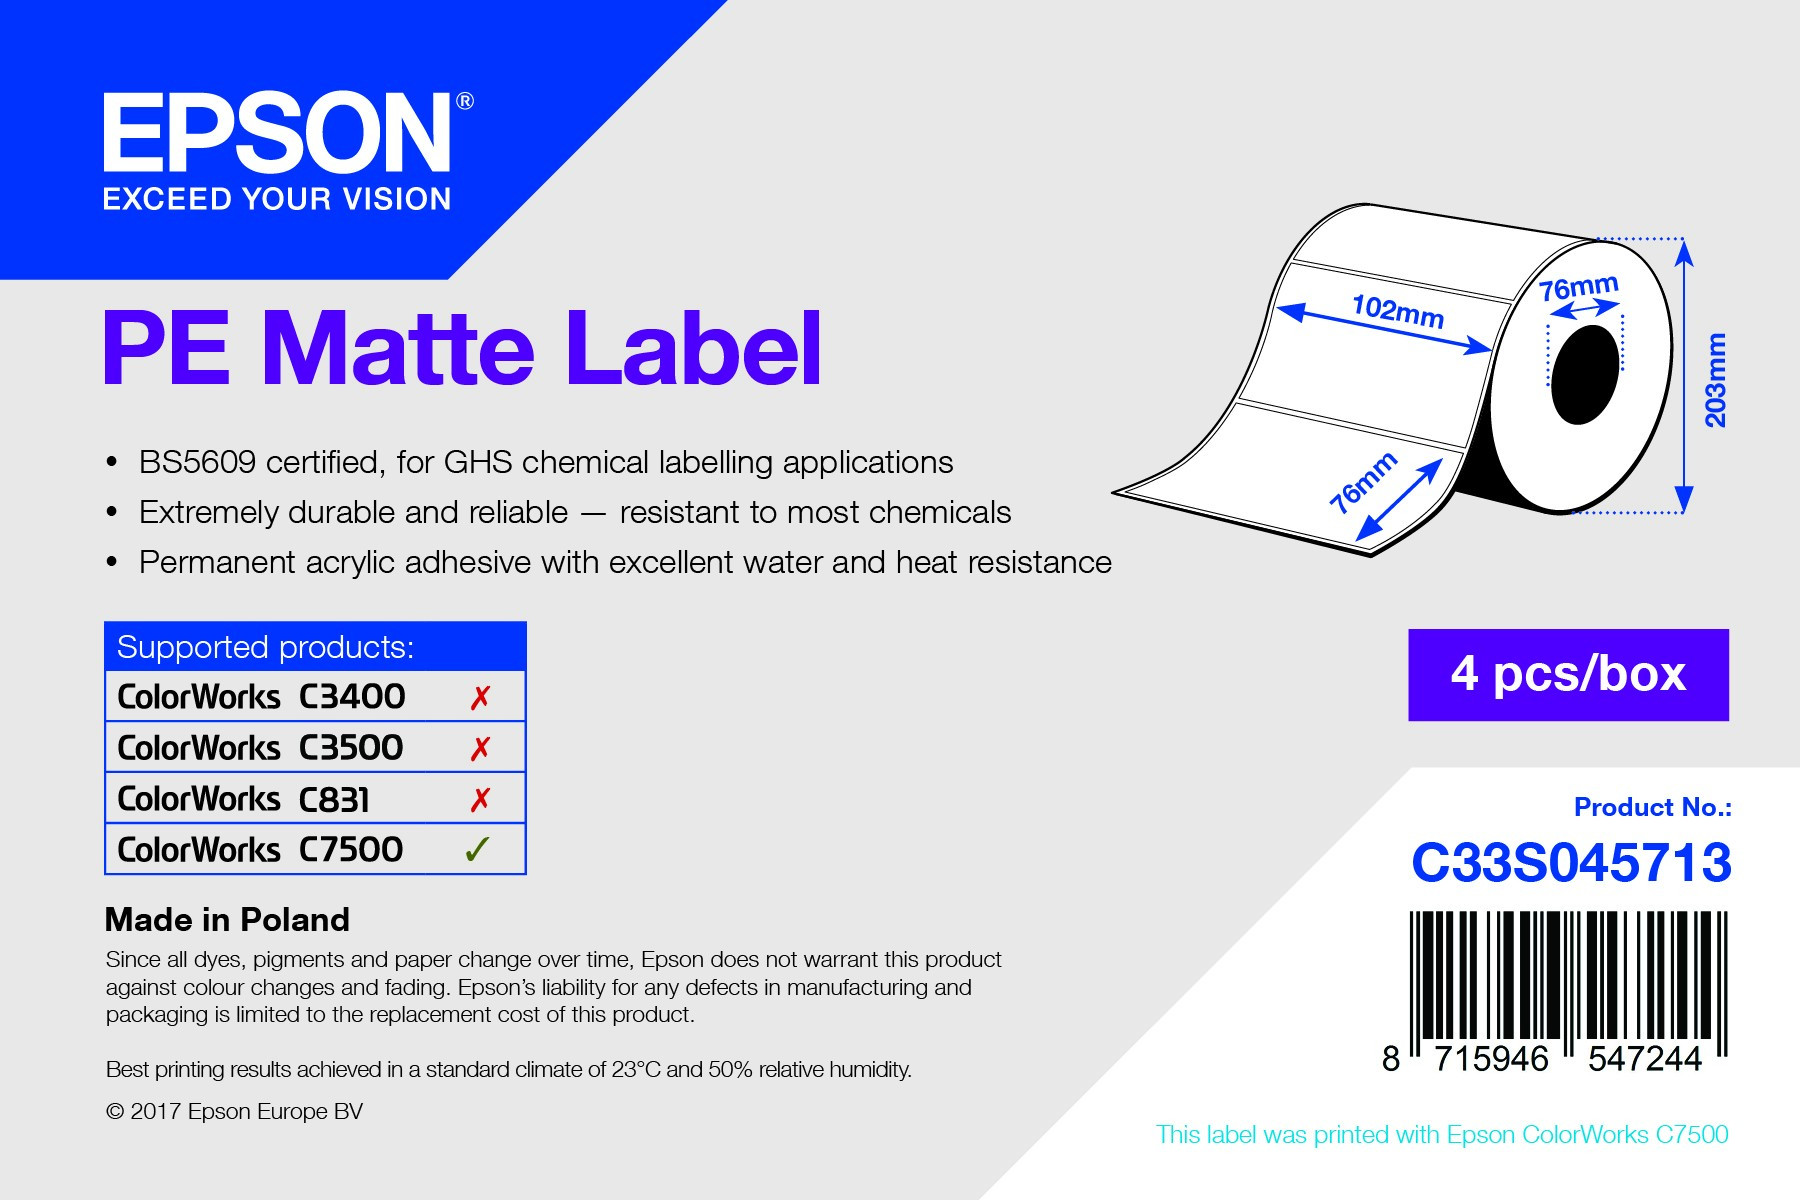 Epson 102mm x 76mm, 1570 matt címke